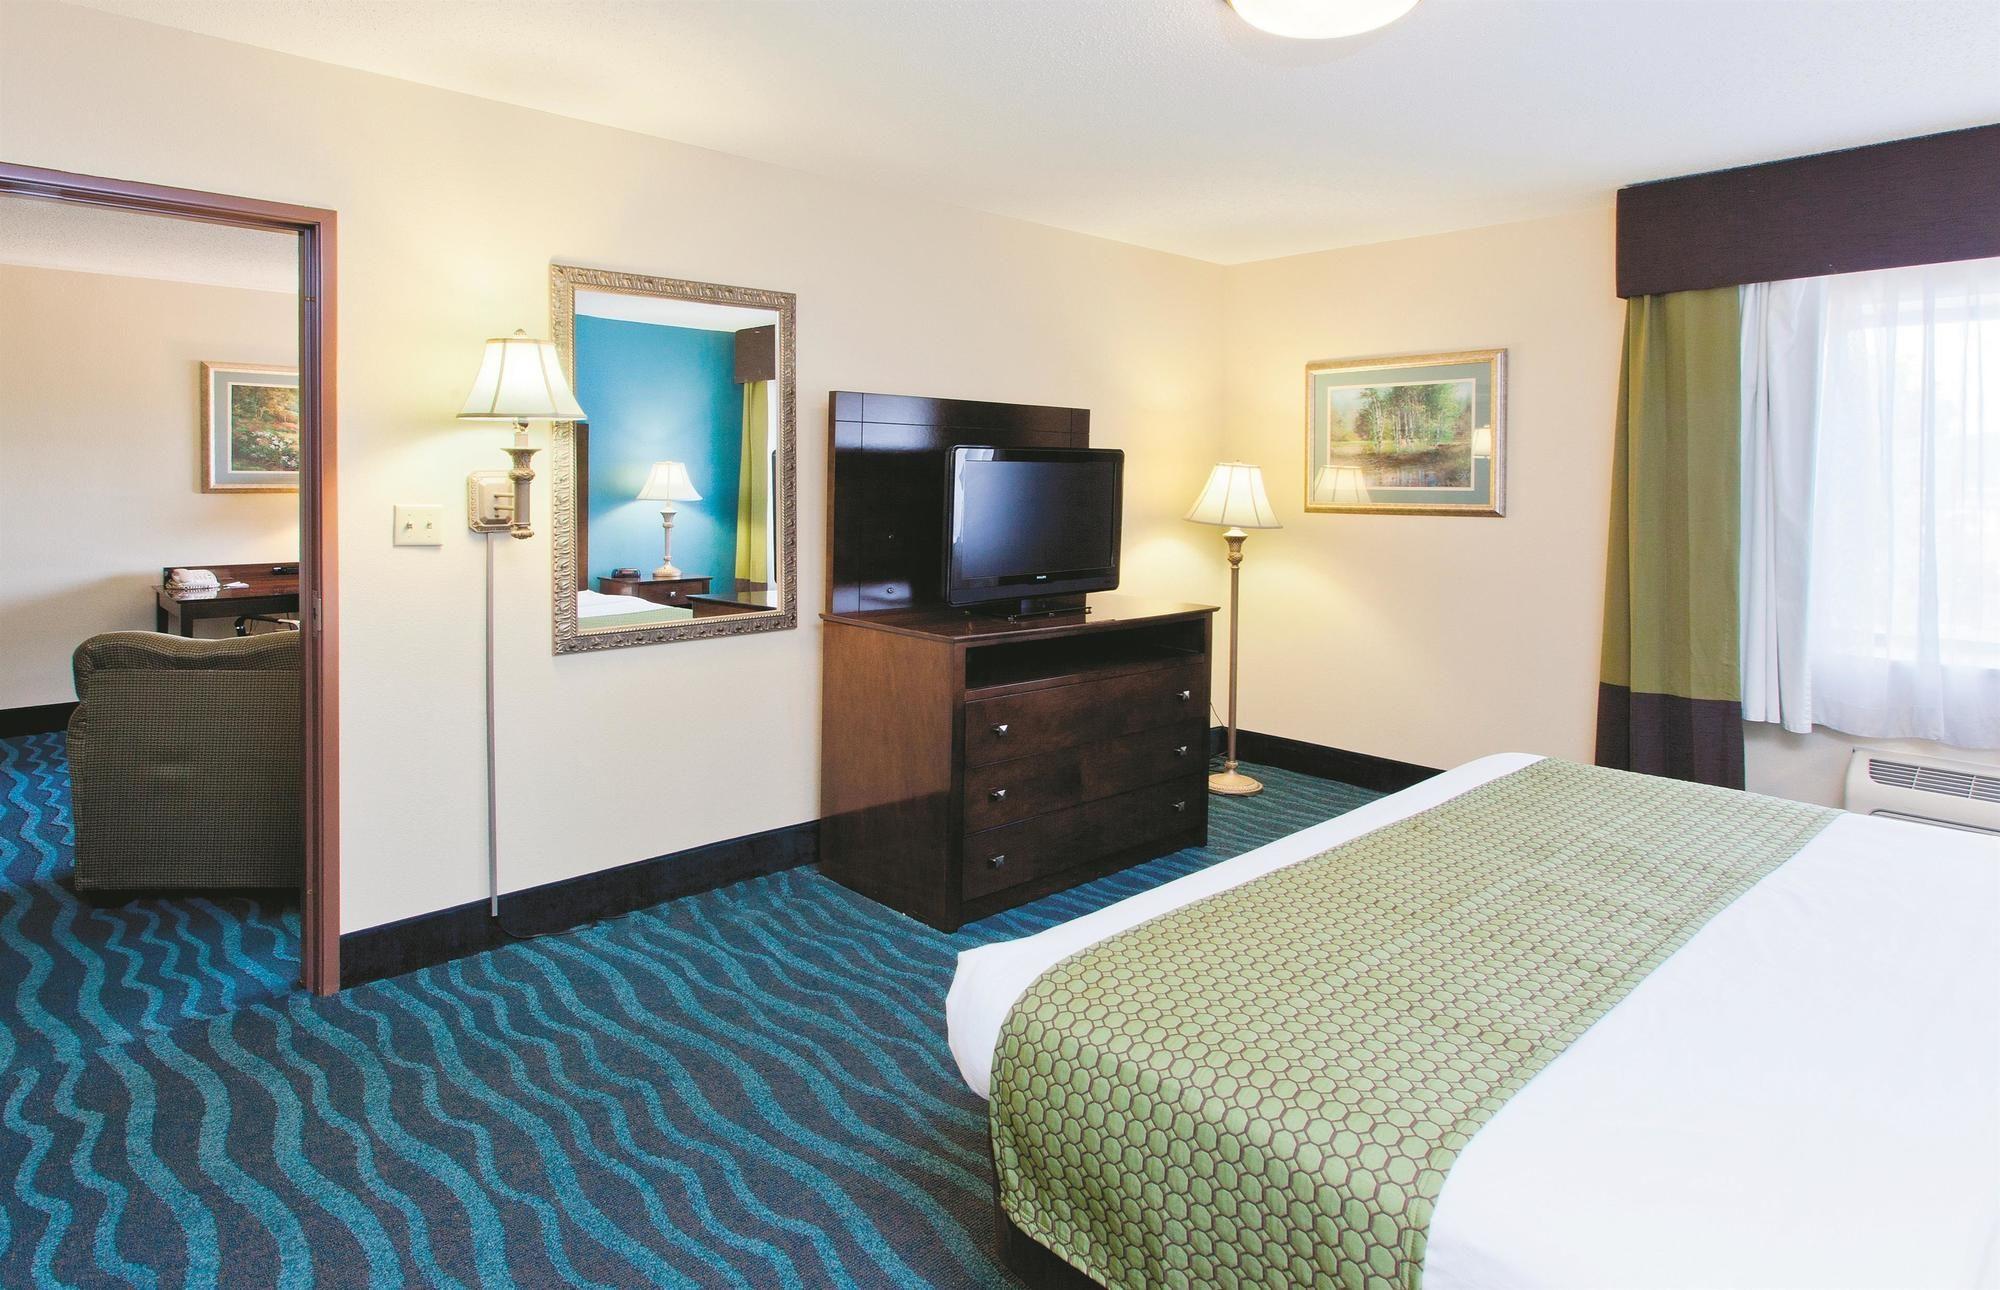 LaQuinta Inn & Suites in Goodlettsville, TN